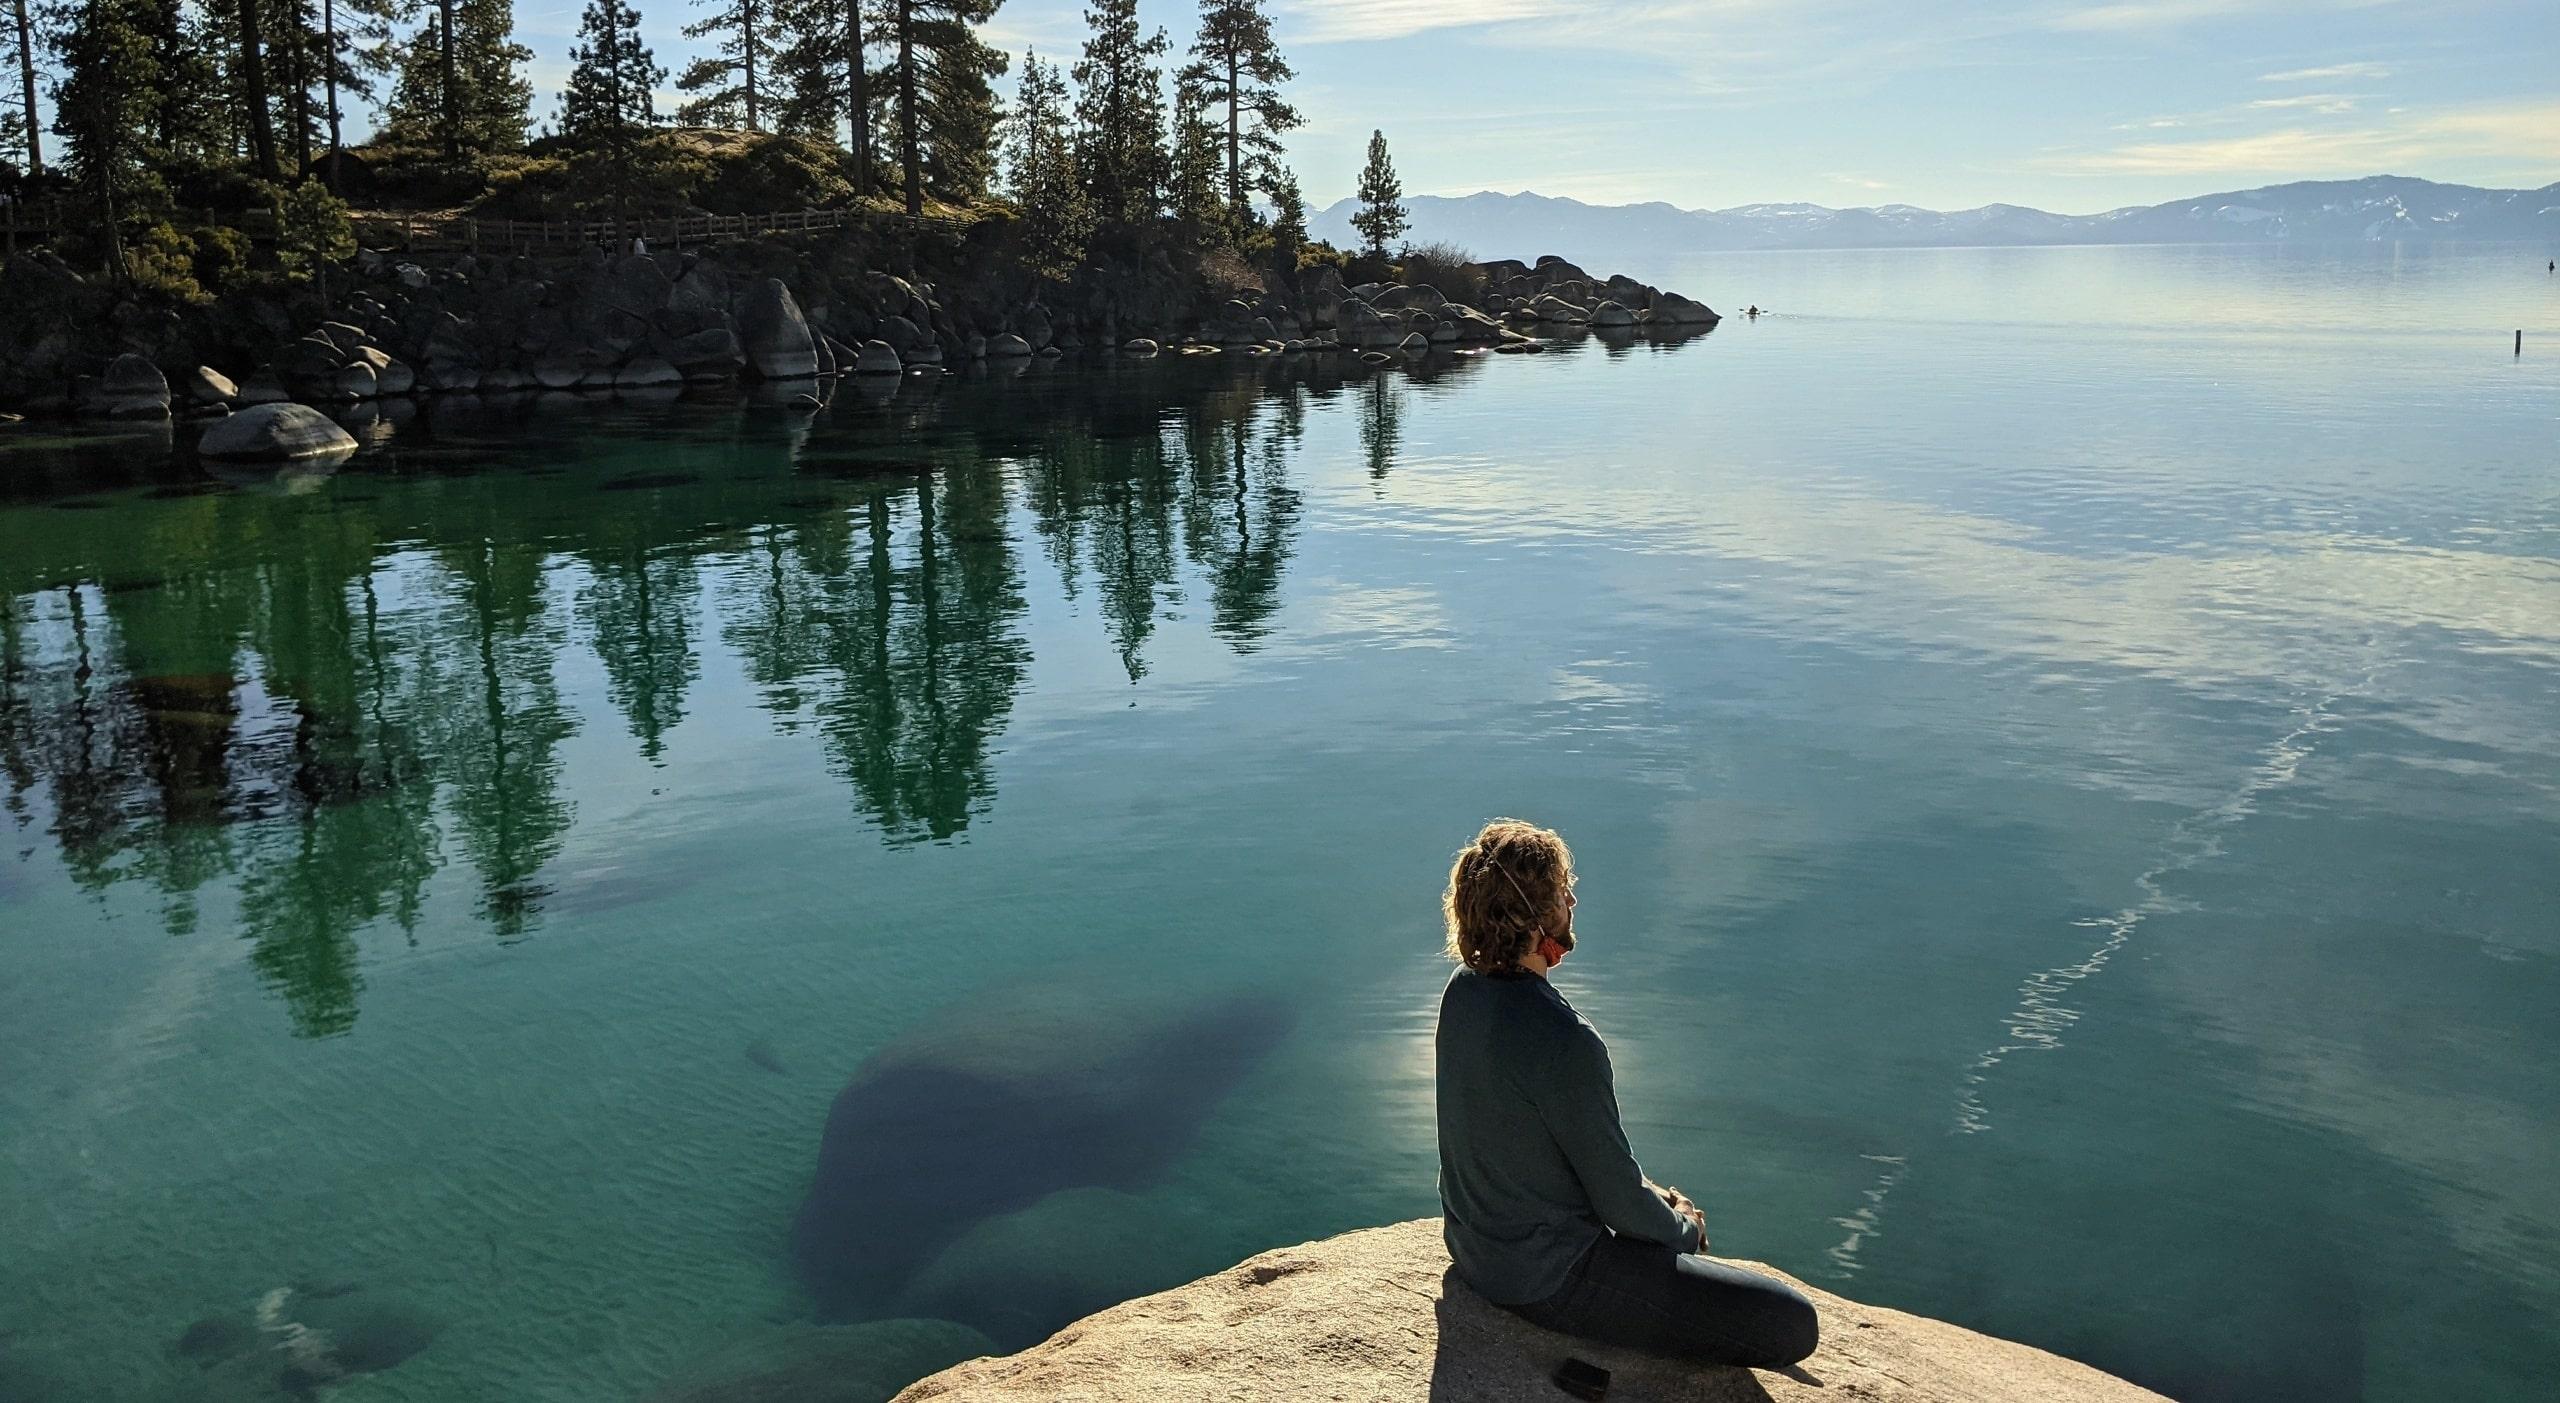 stillness-meditation-outdoors-nature